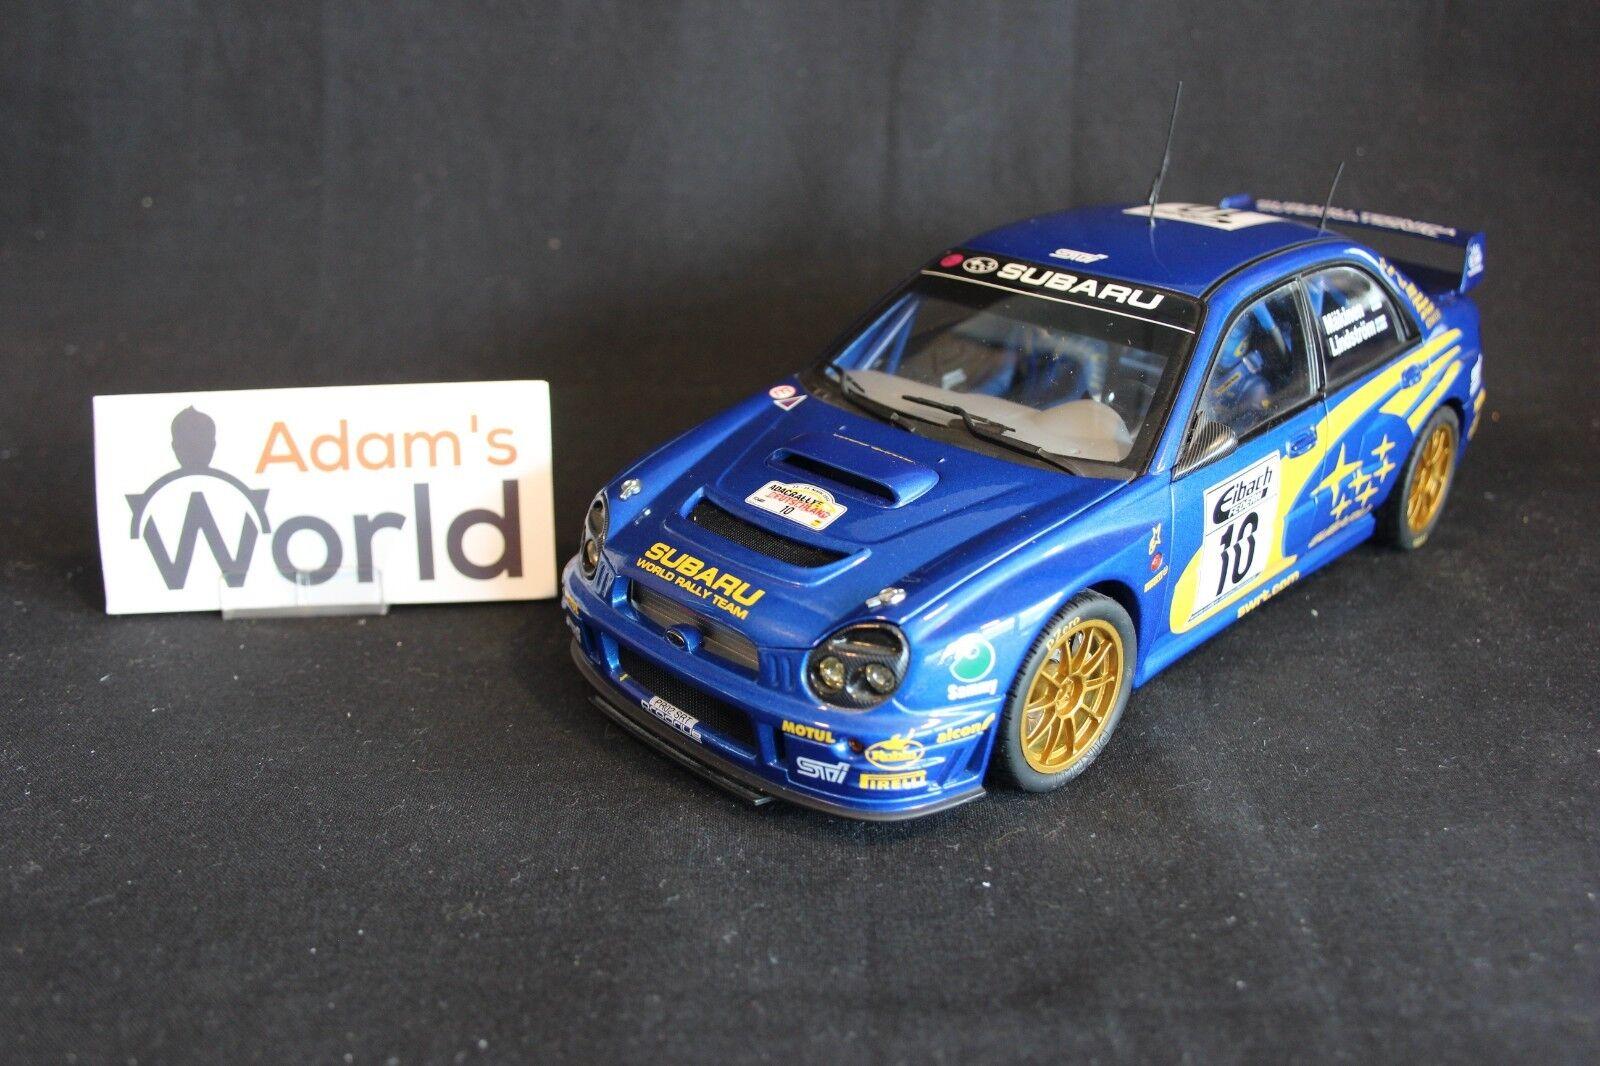 AutoArt Subaru Impreza S8 WRC '02 1 18  10 Mäkinen   Lindström Germ (JvdM) fig.